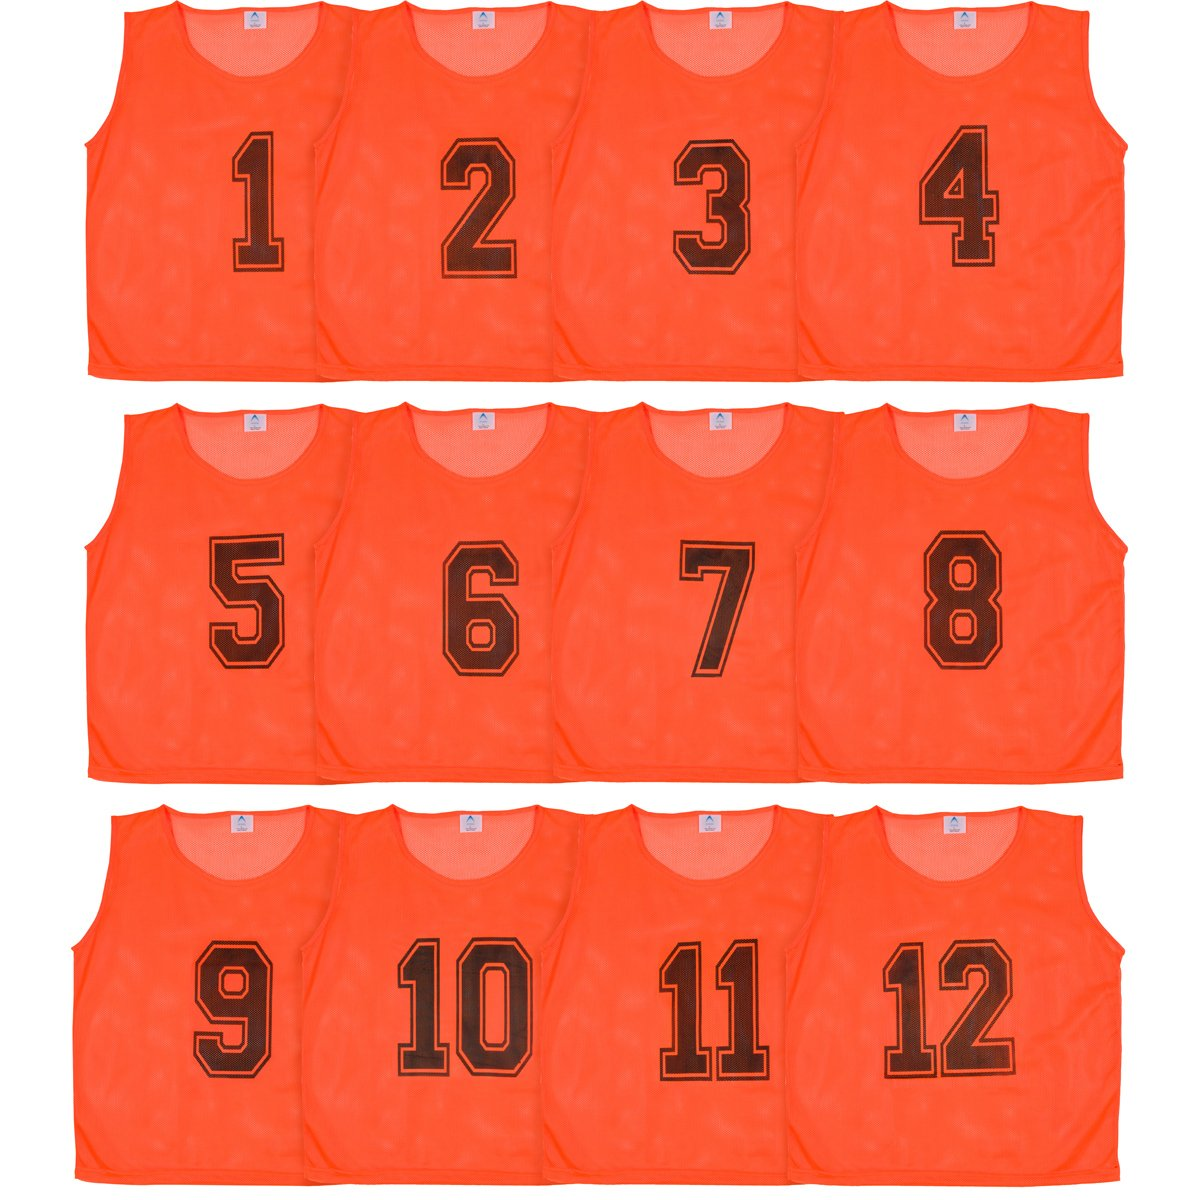 Scrimmage Vest//Pinnies//Team Practice Jerseys with F Athllete DURAMESH Set of 6